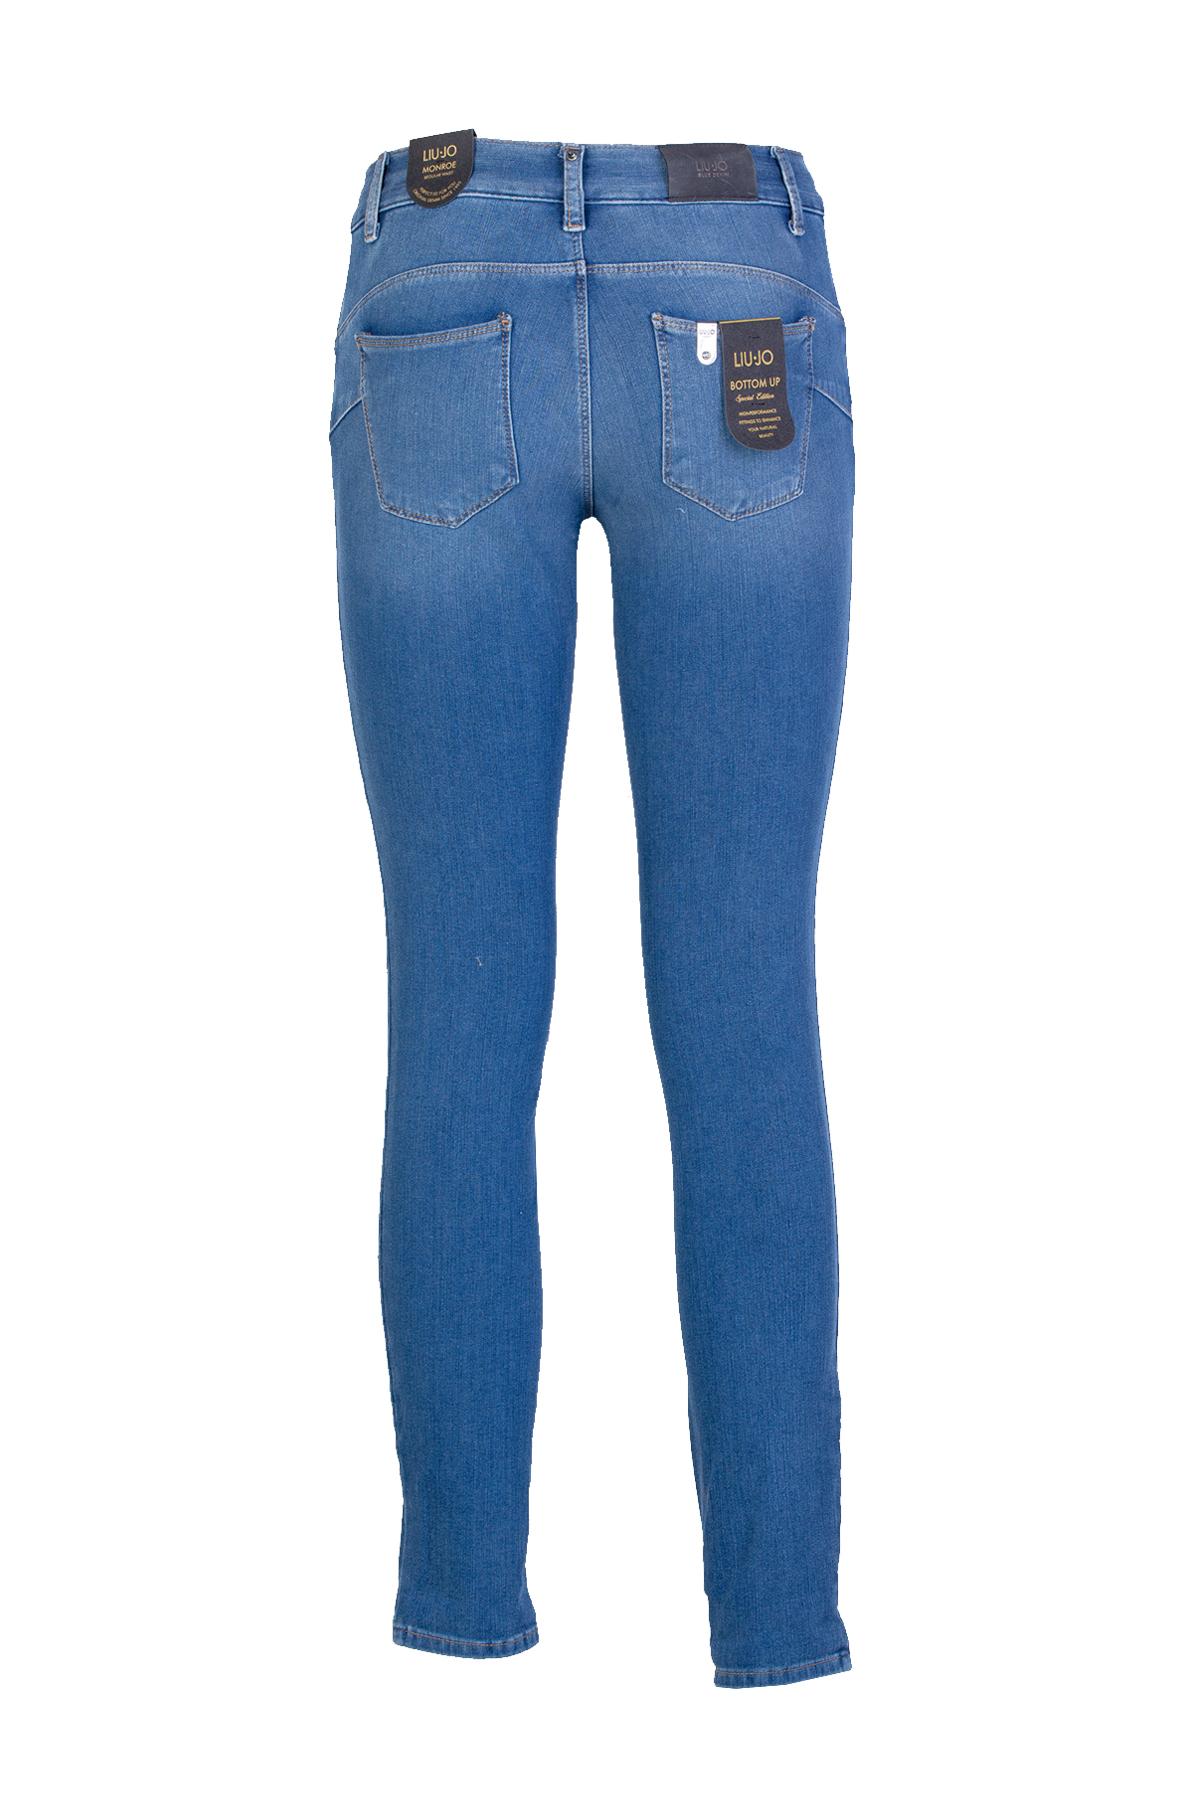 JEANS SHINNY LIU JO BLUE DENIM | Jeans | U18056D419577538DENBLZIPPER